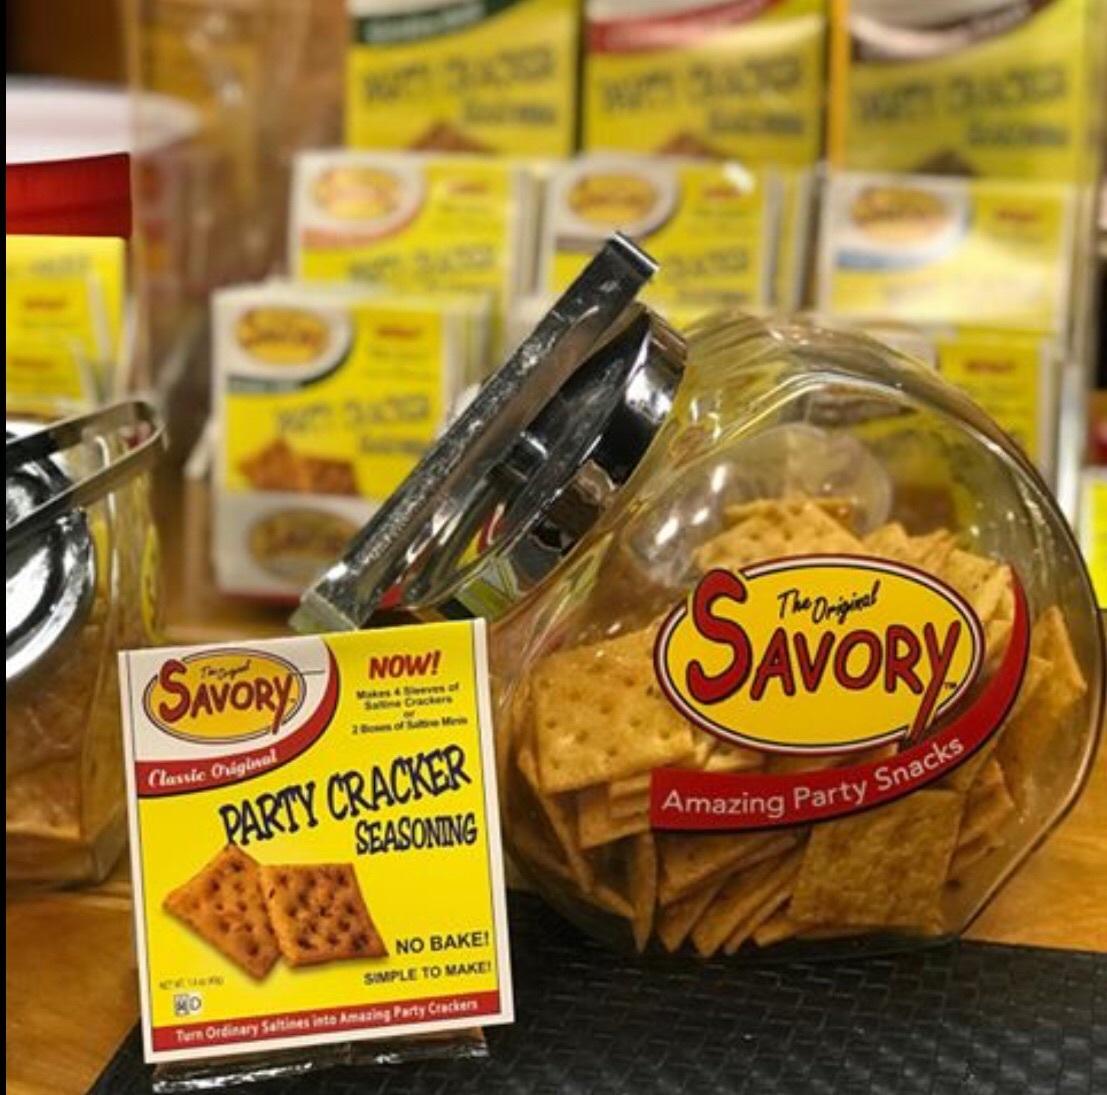 Savory Party Cracker Seasoning Original